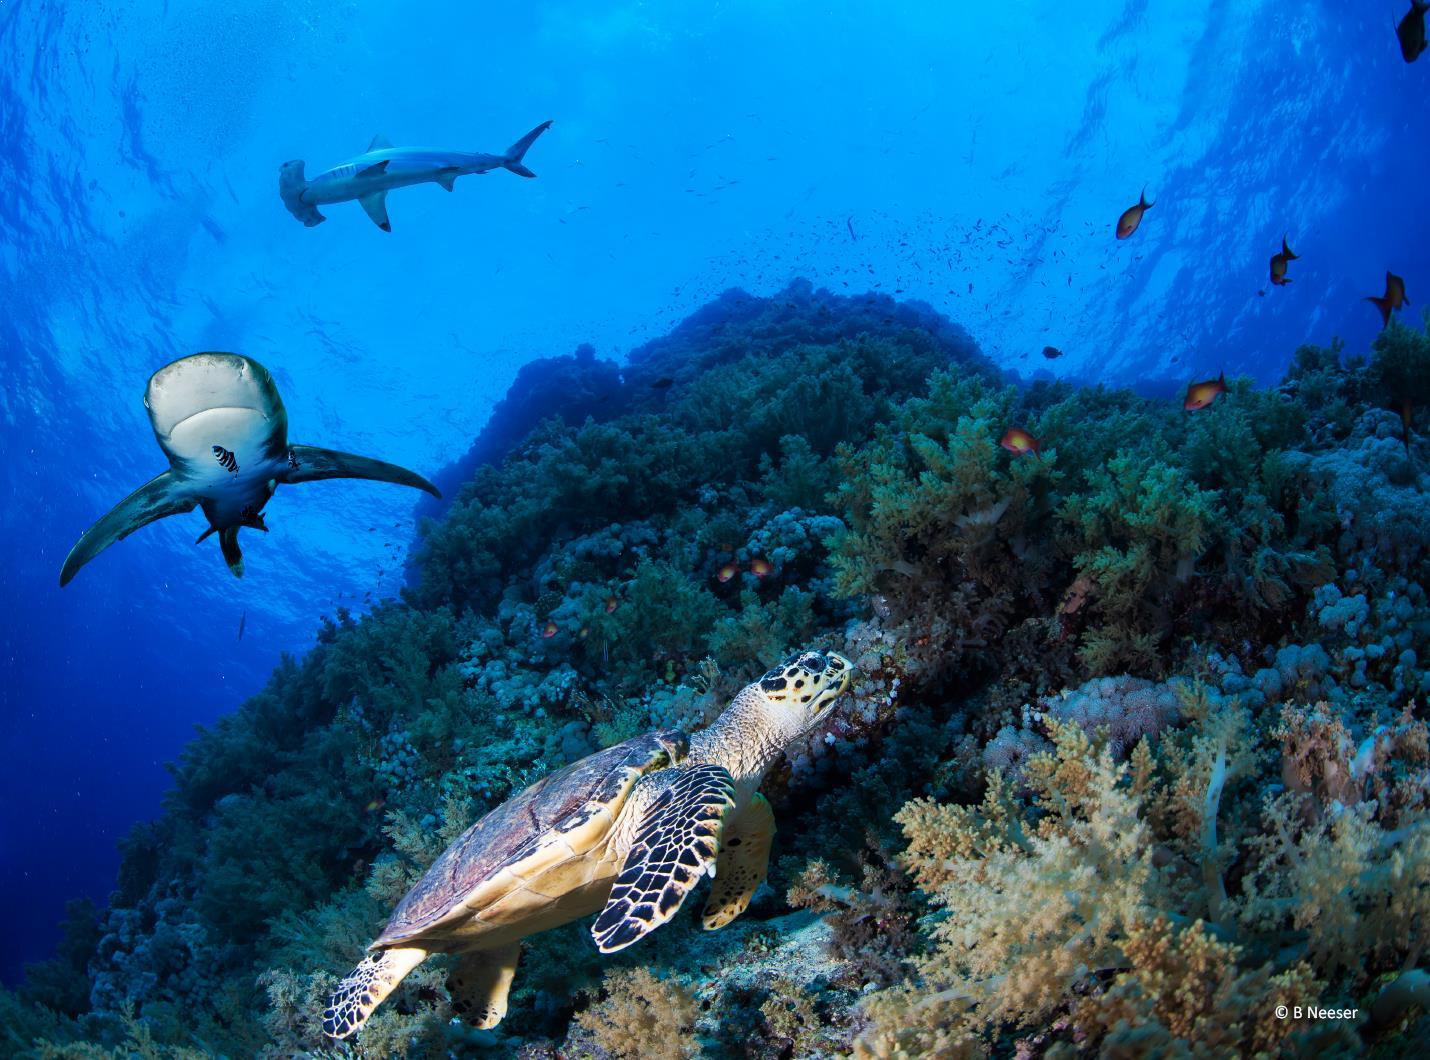 Shark_Turtle_Neeser_small